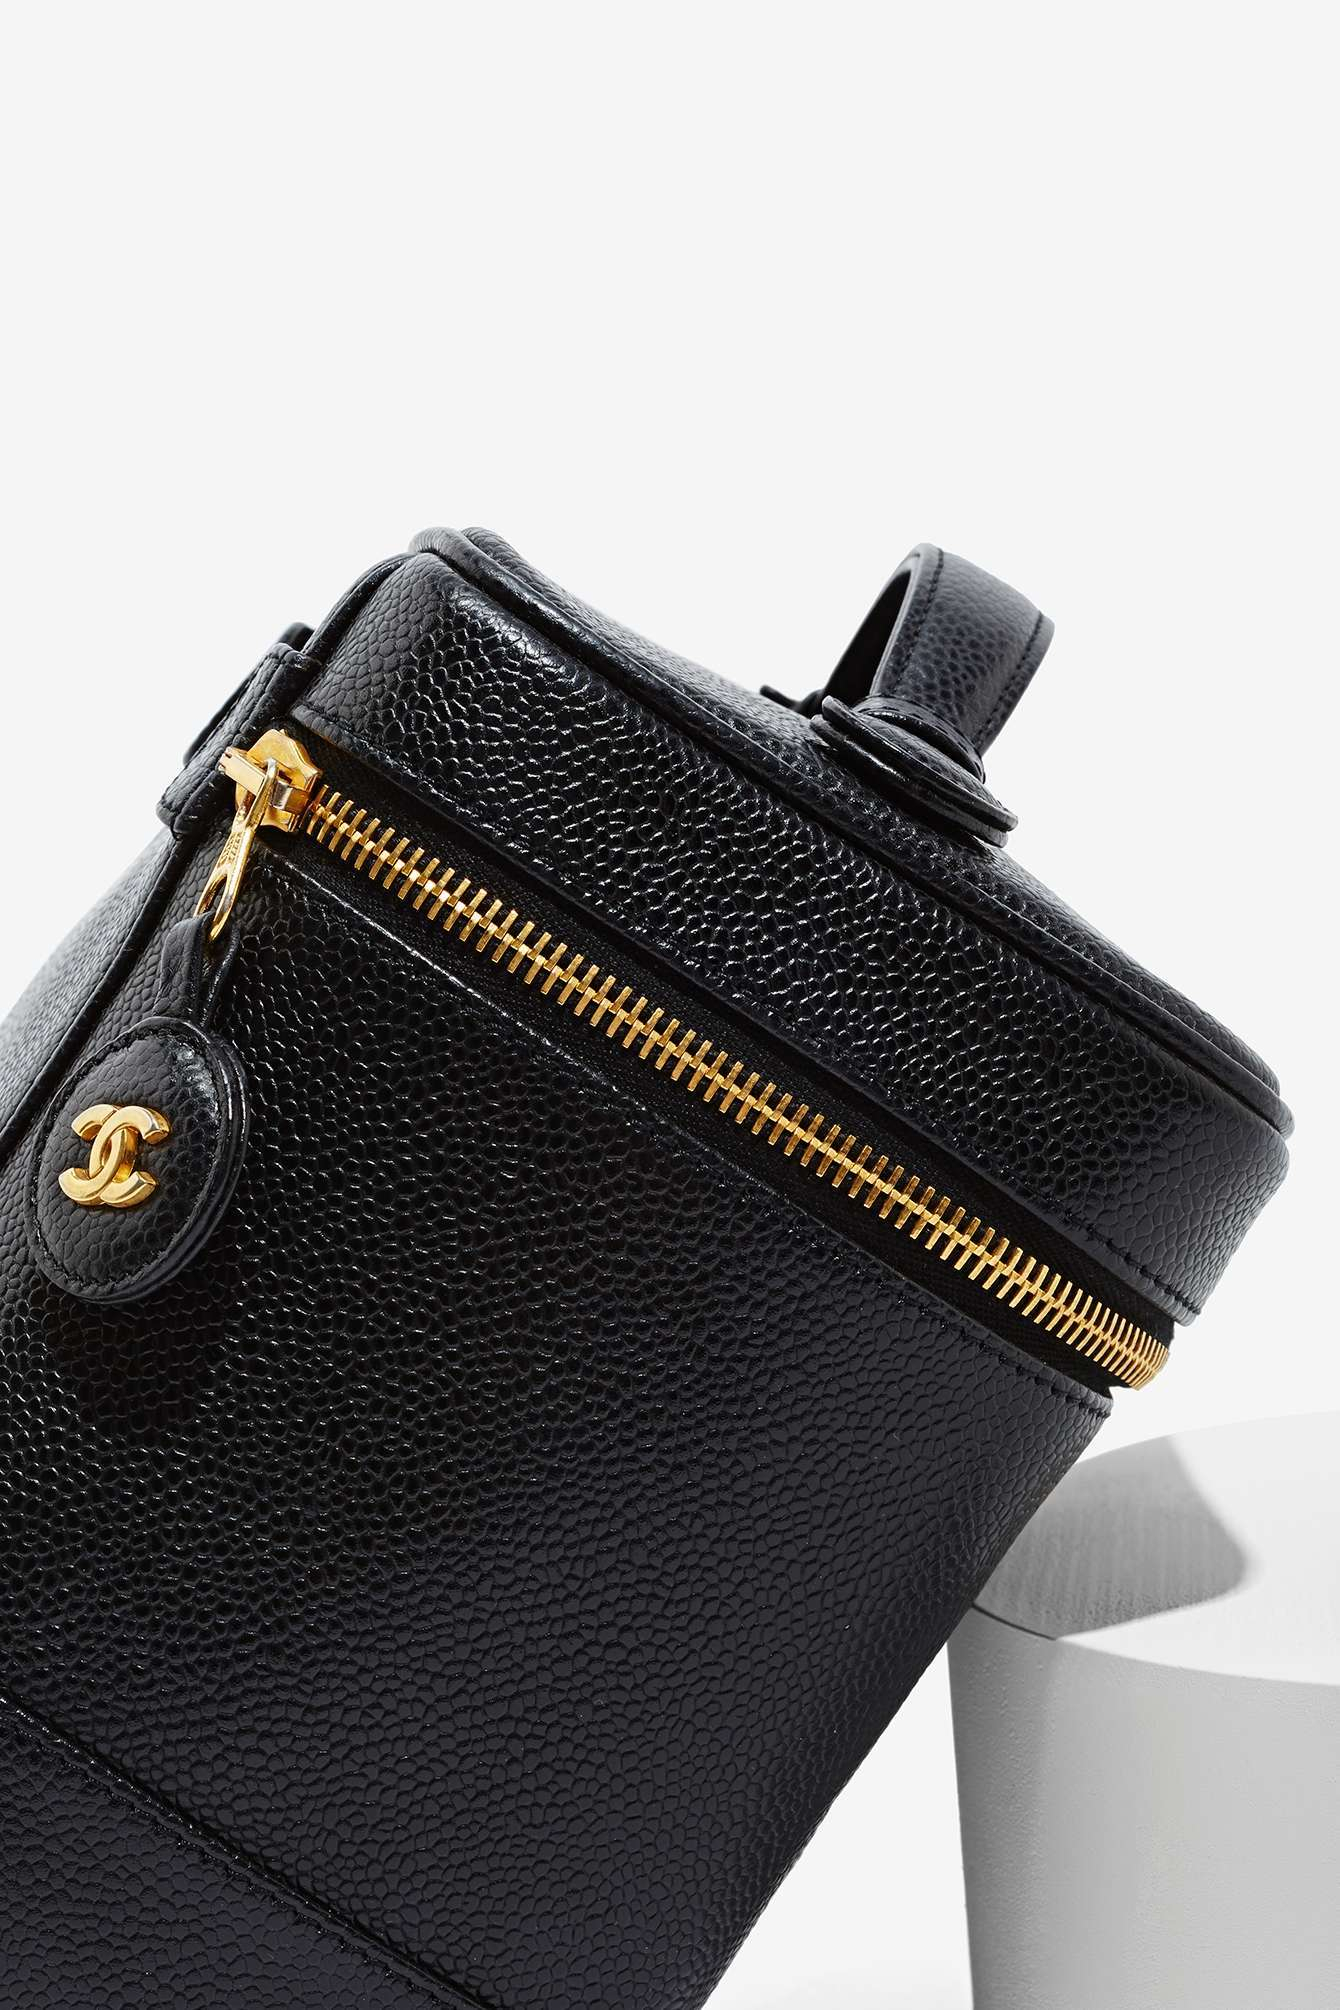 8b1a4c46bb562e Nasty Gal Vintage Chanel Black Caviar Vanity Case in Black - Lyst